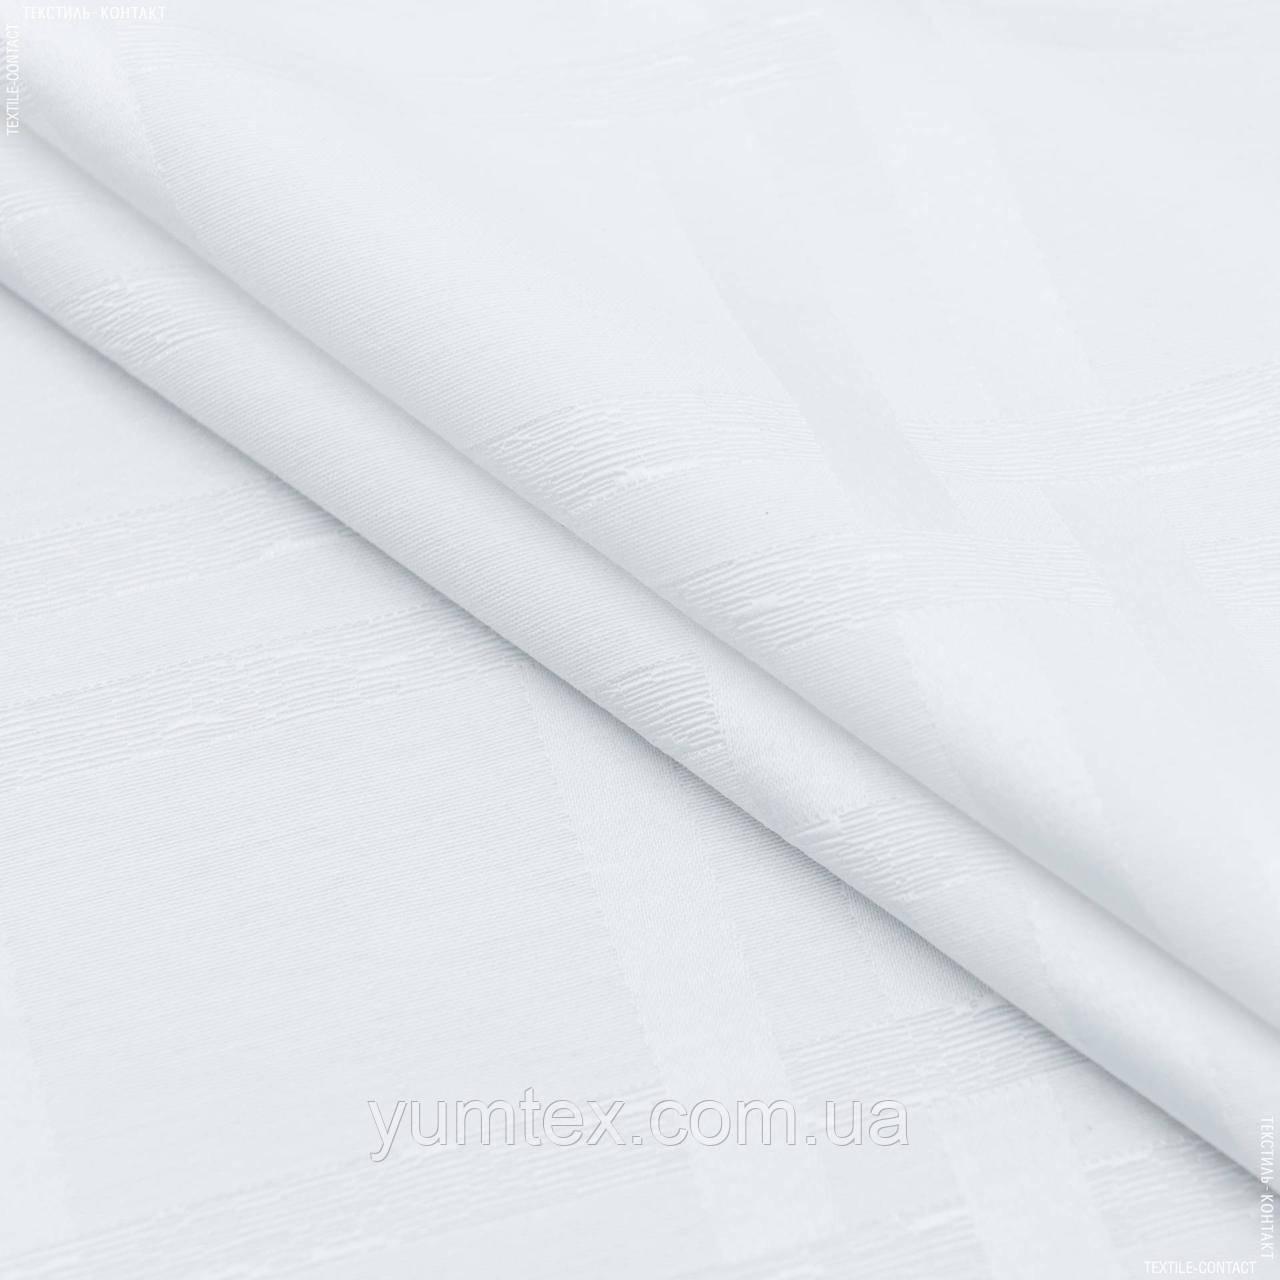 Скатертная  ткань жаккард улис/  ulises клетка,белый 148927